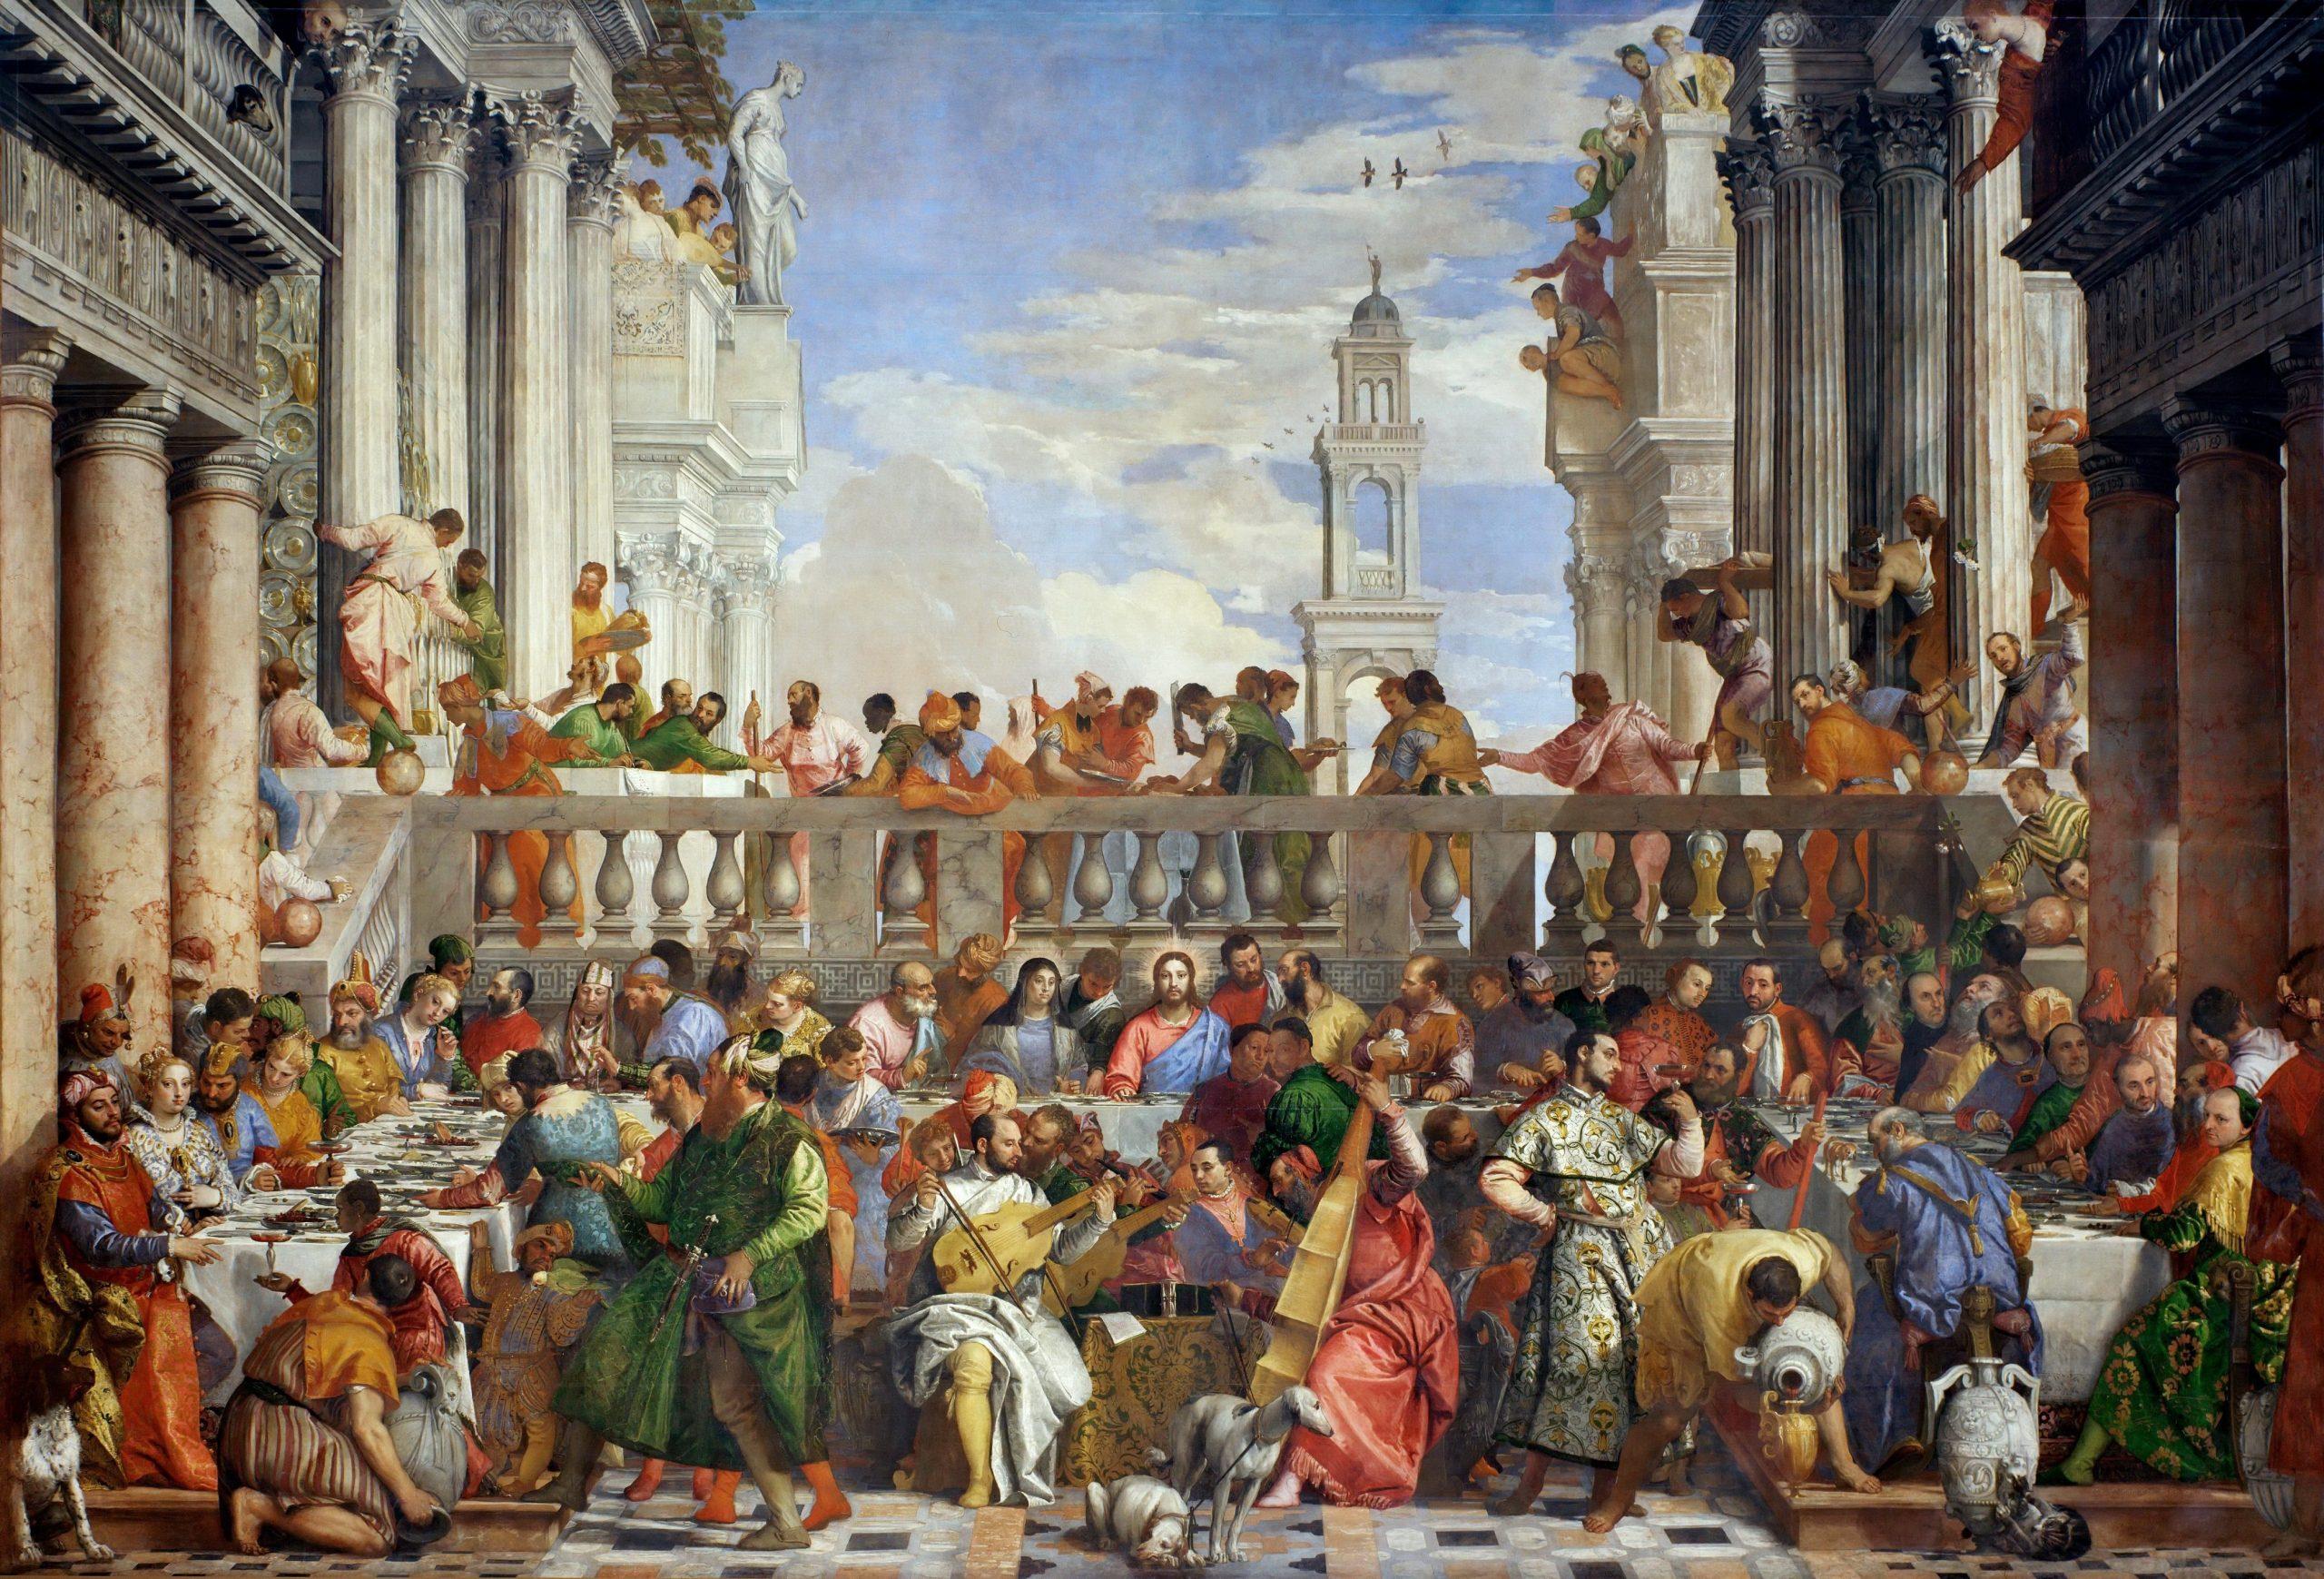 Veronese Wedding at Cana